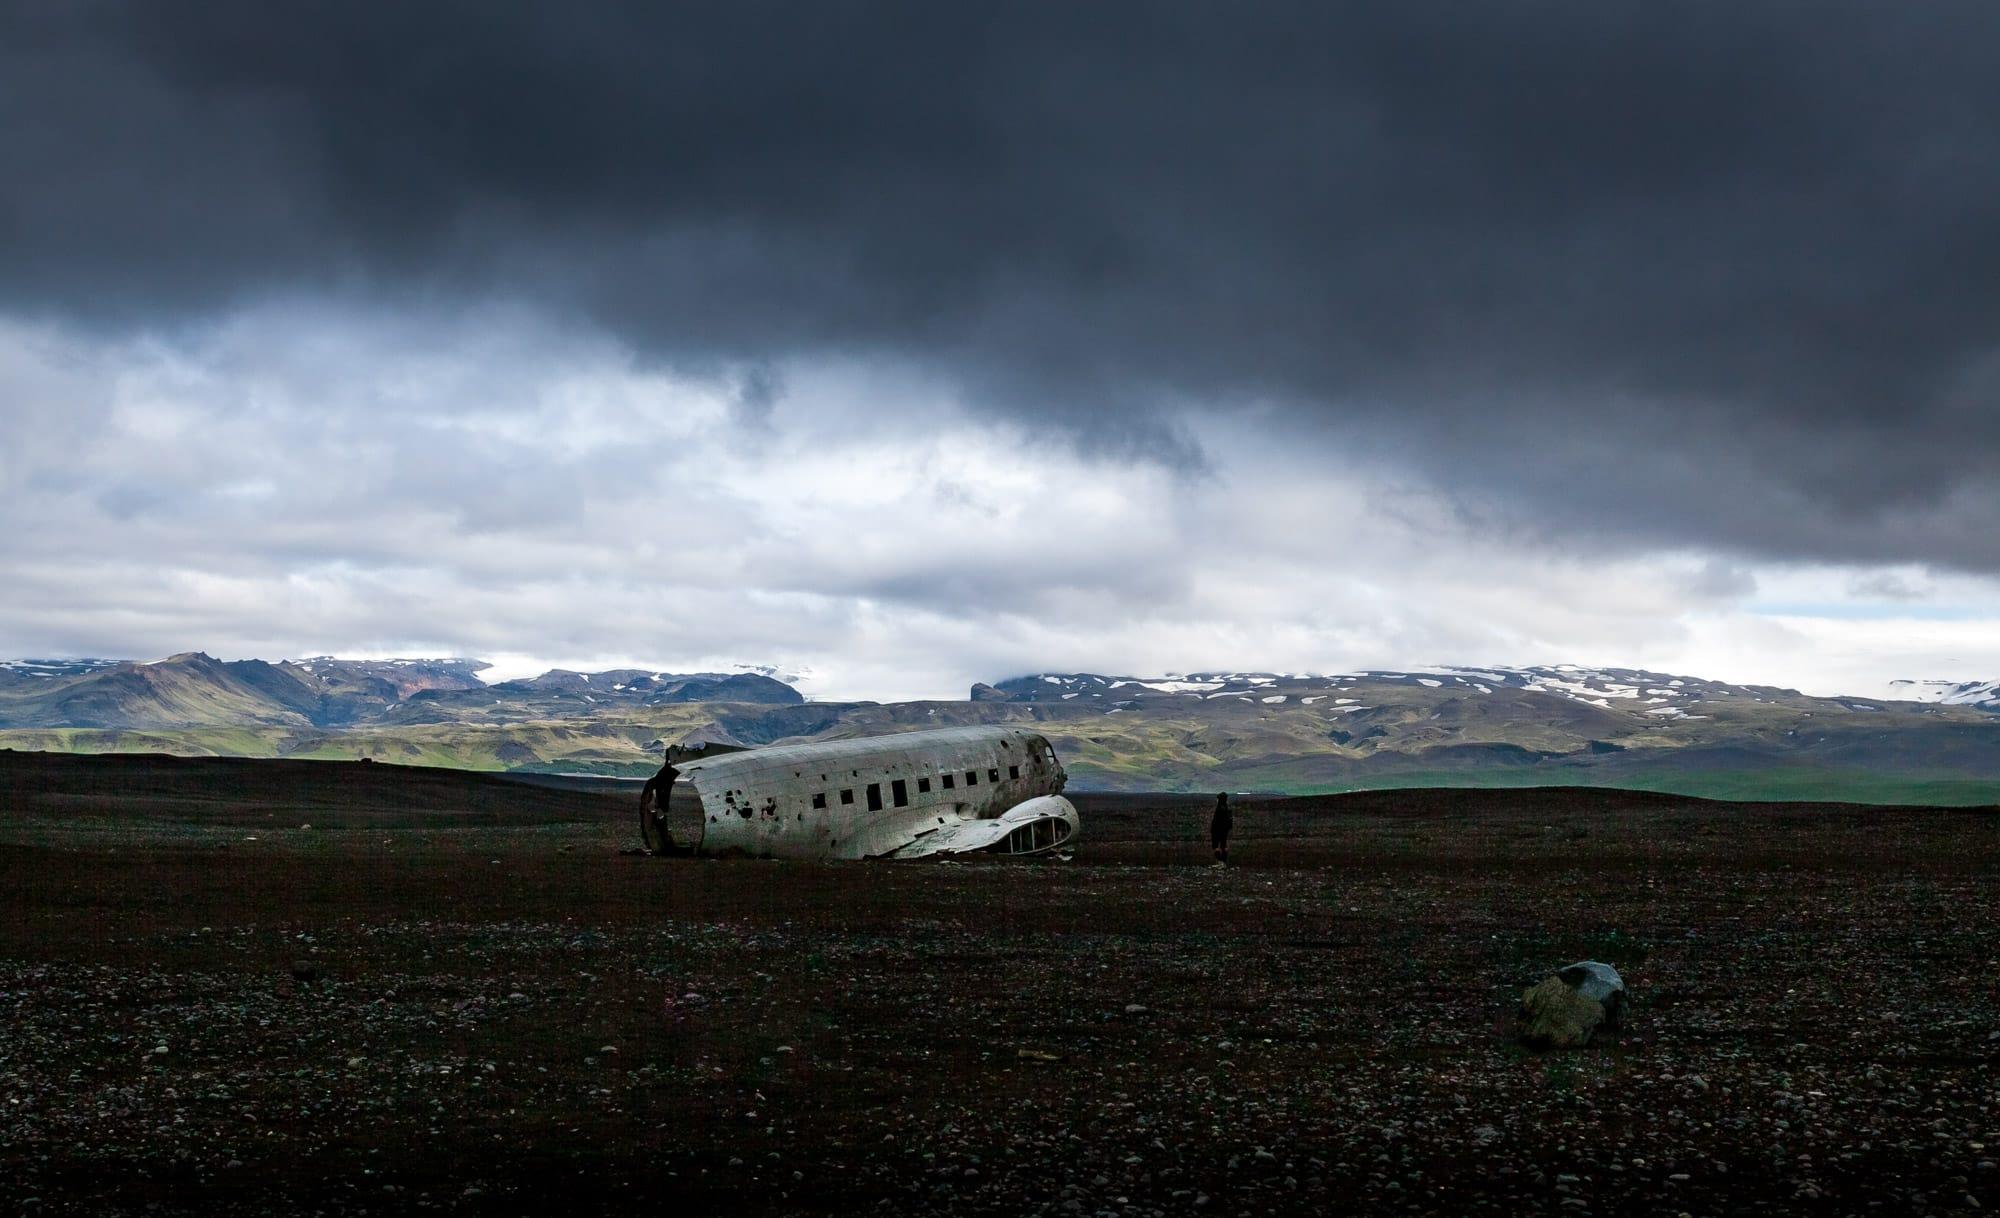 Karte Island Flugzeugwrack.Island Flugzeugwrack Douglas Super Dc 3